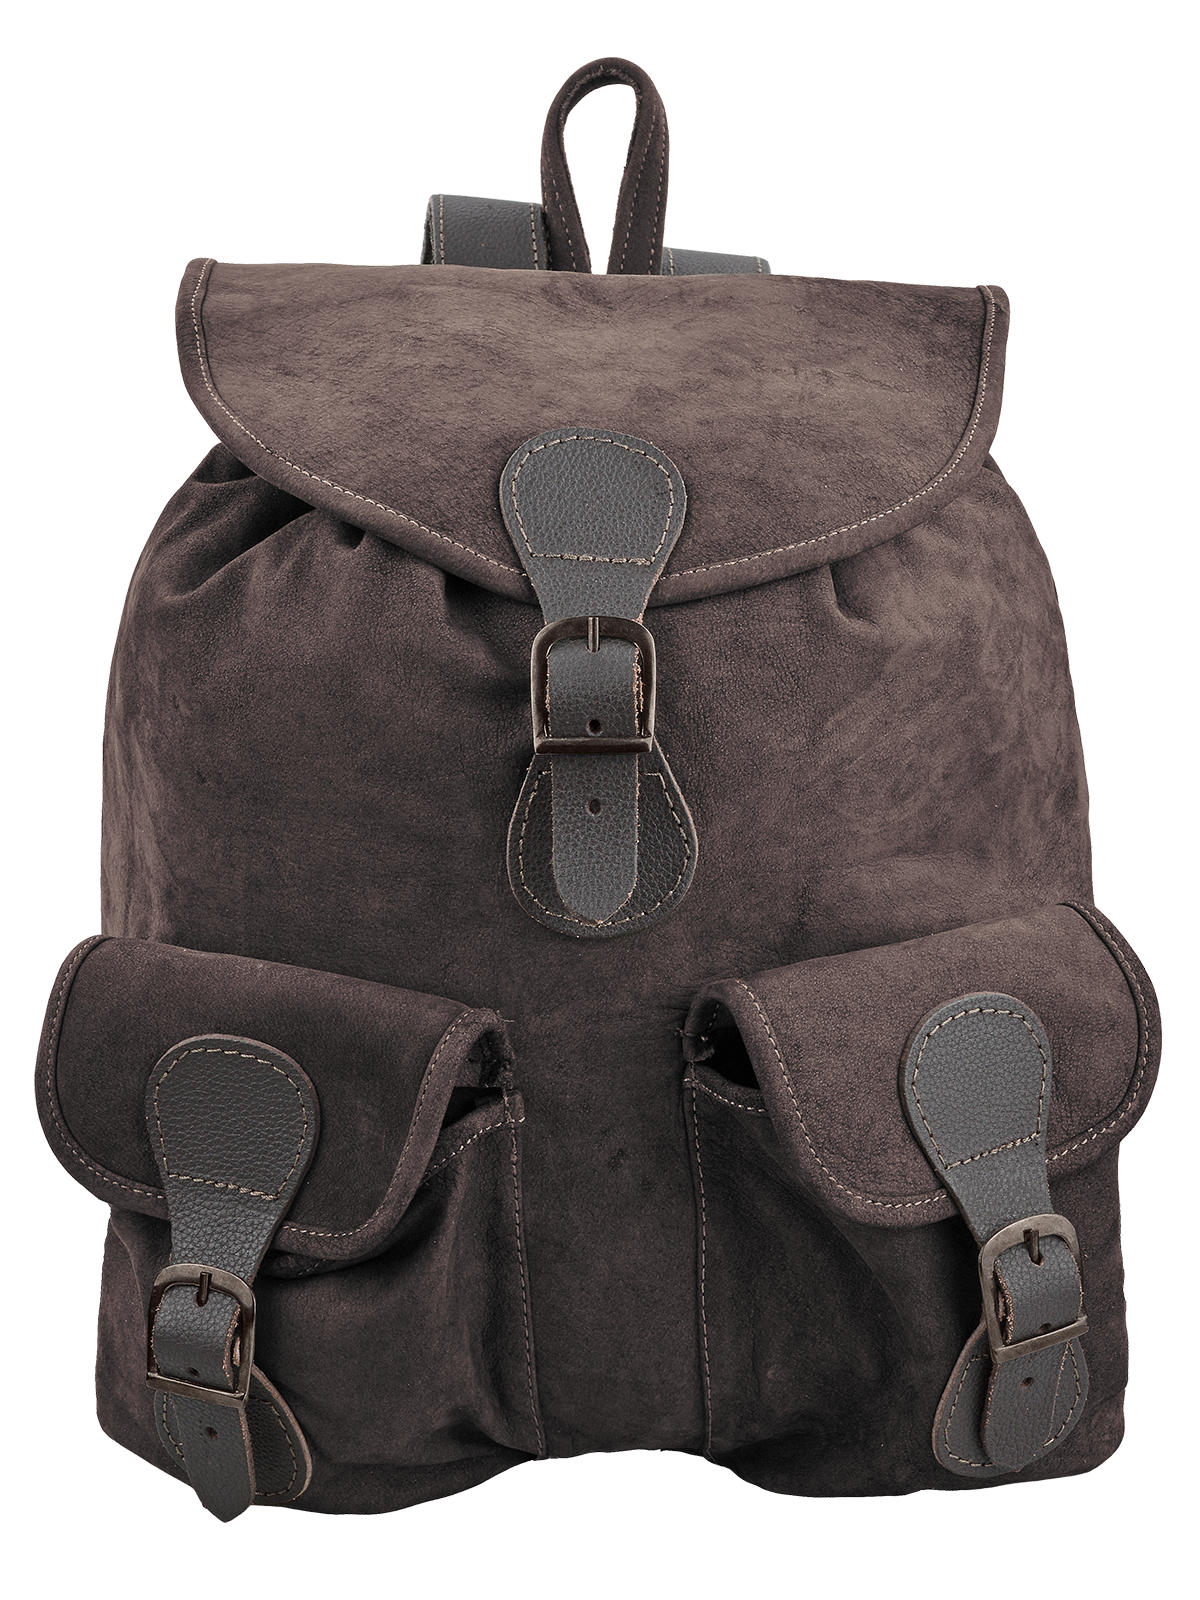 427fb8fa034b batoh BATON kožený